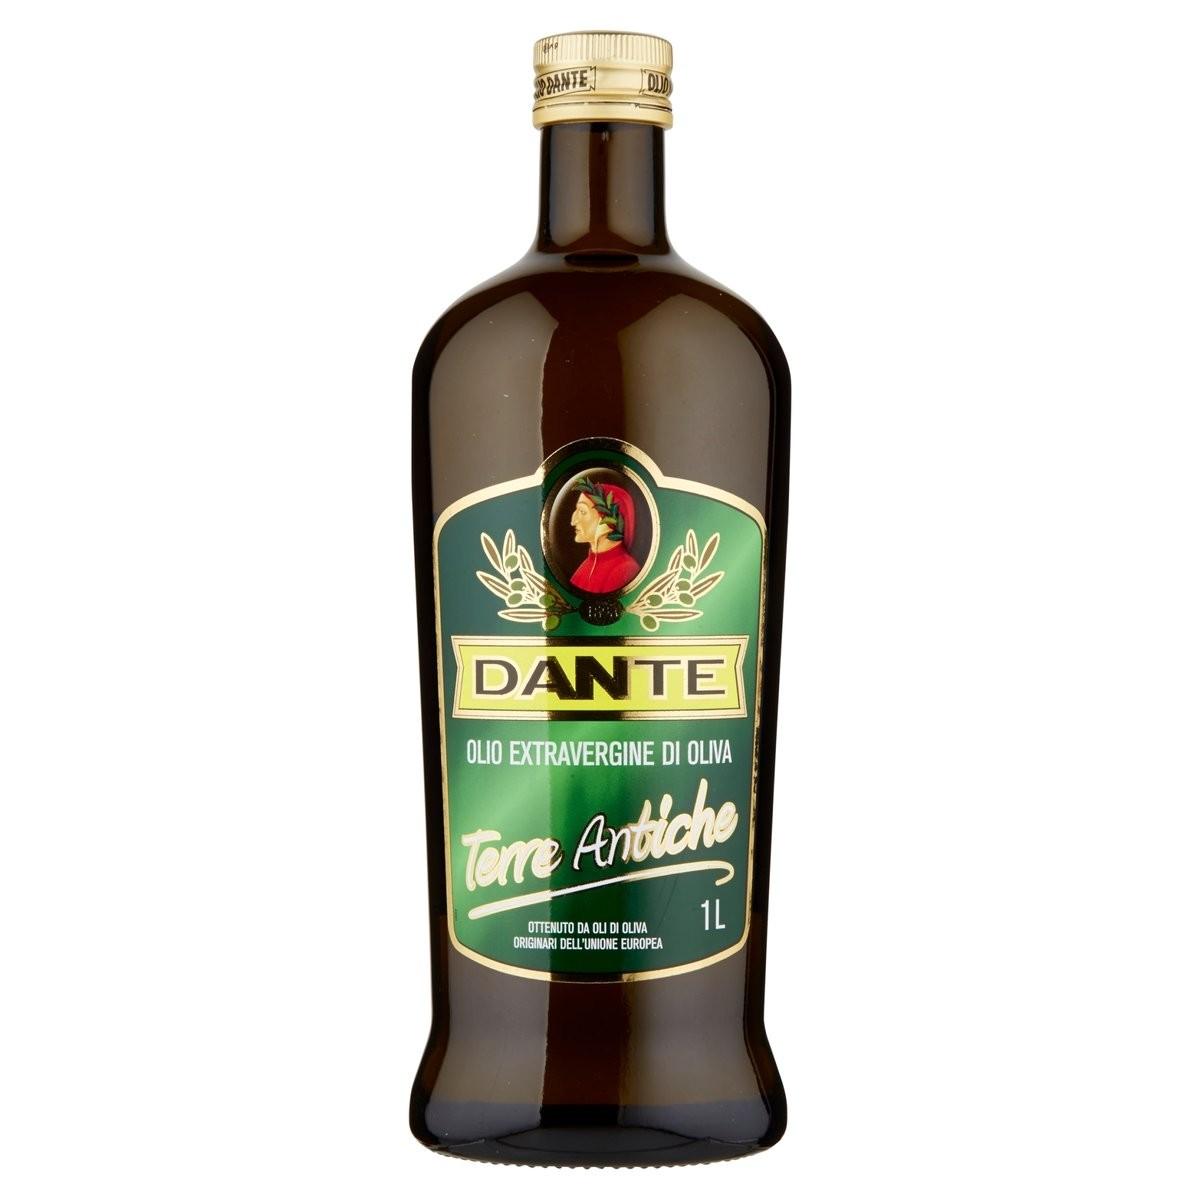 Dante Olio extravergine di oliva Terre Antiche